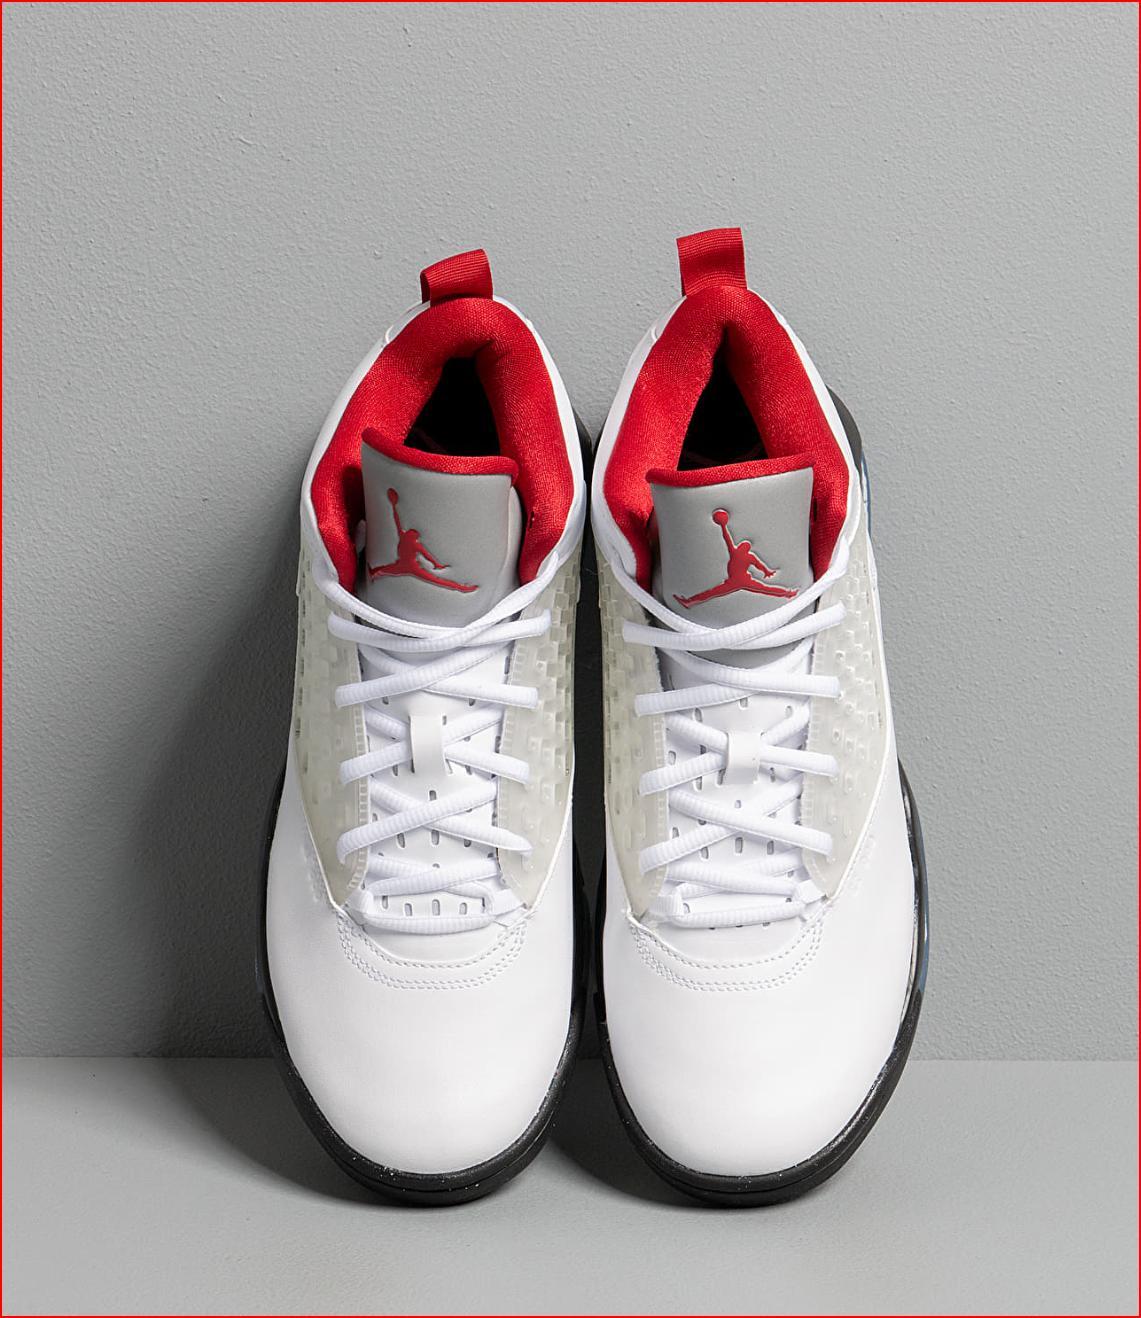 200 Basketball White/Gym Colorway!